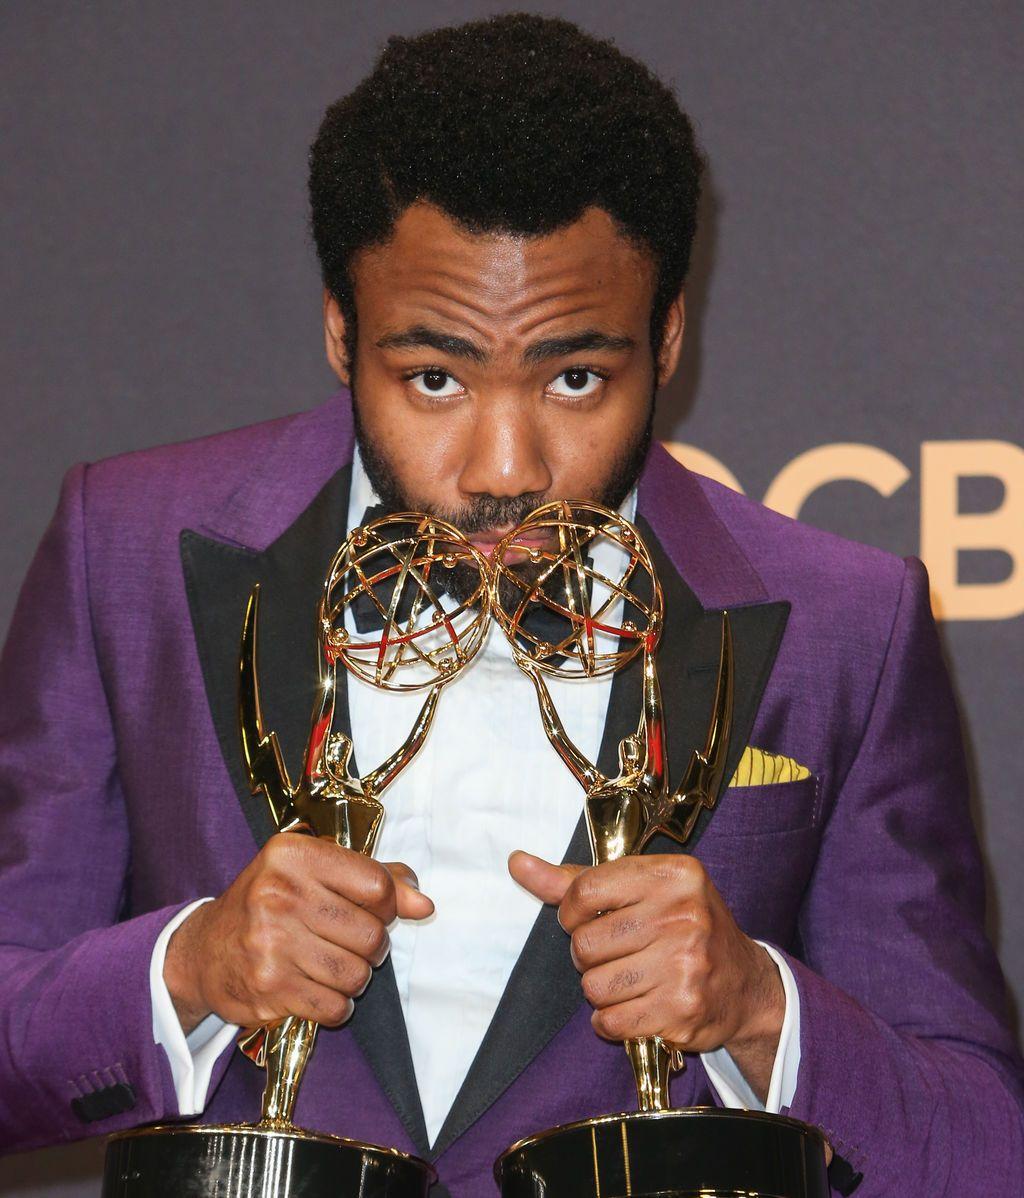 'The Handmaid's Tale' hace historia y HBO vuelve a conquistar los Emmy 2017